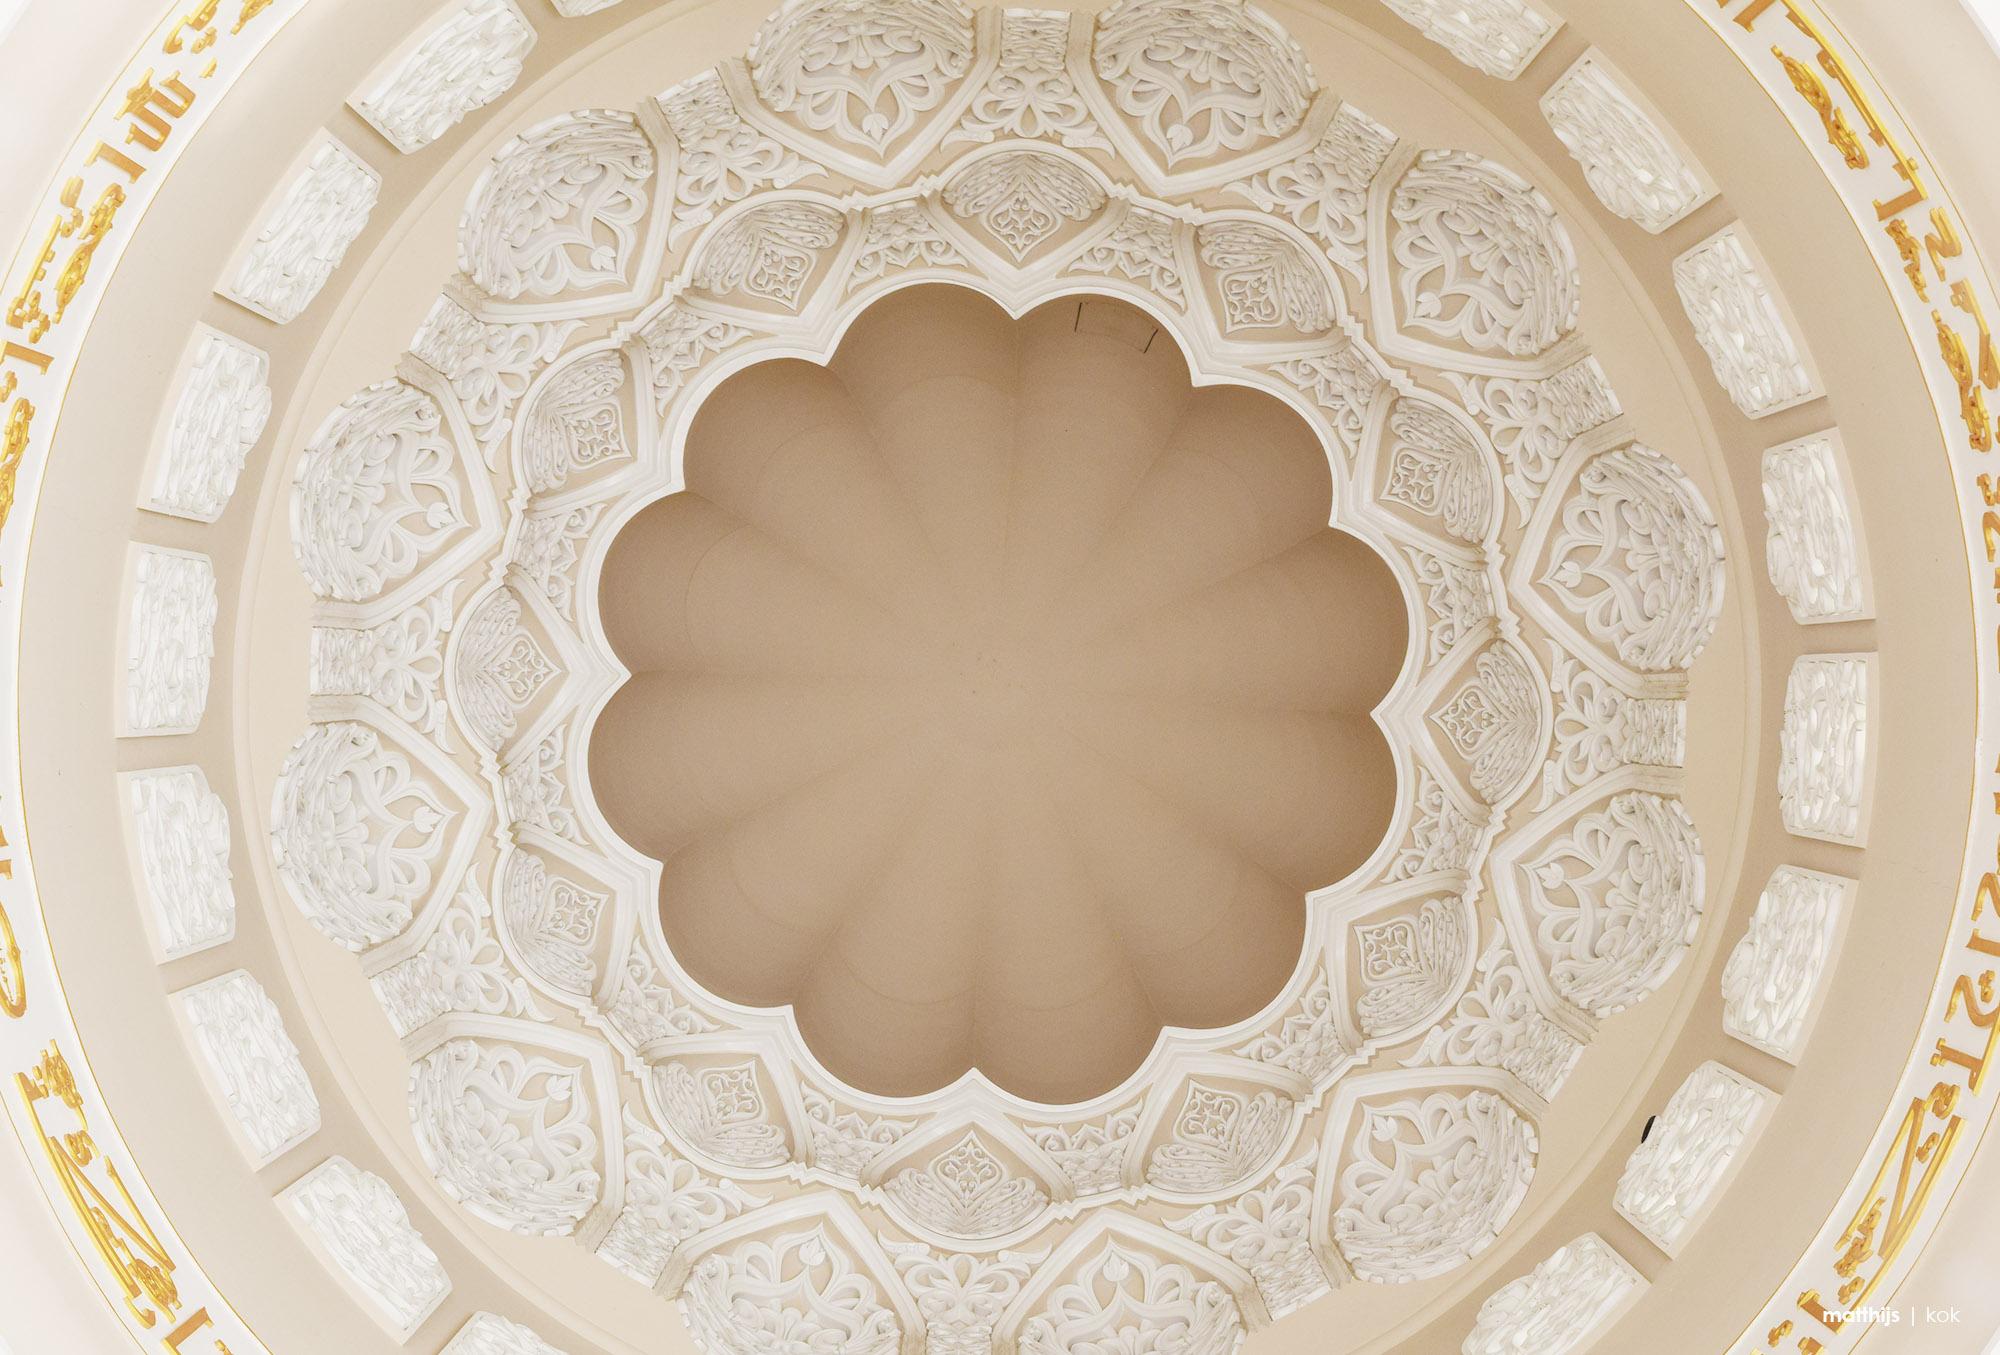 Sheikh Zayed Grand Mosque, Abu Dhabi, UAE | Photo by Matthijs Kok